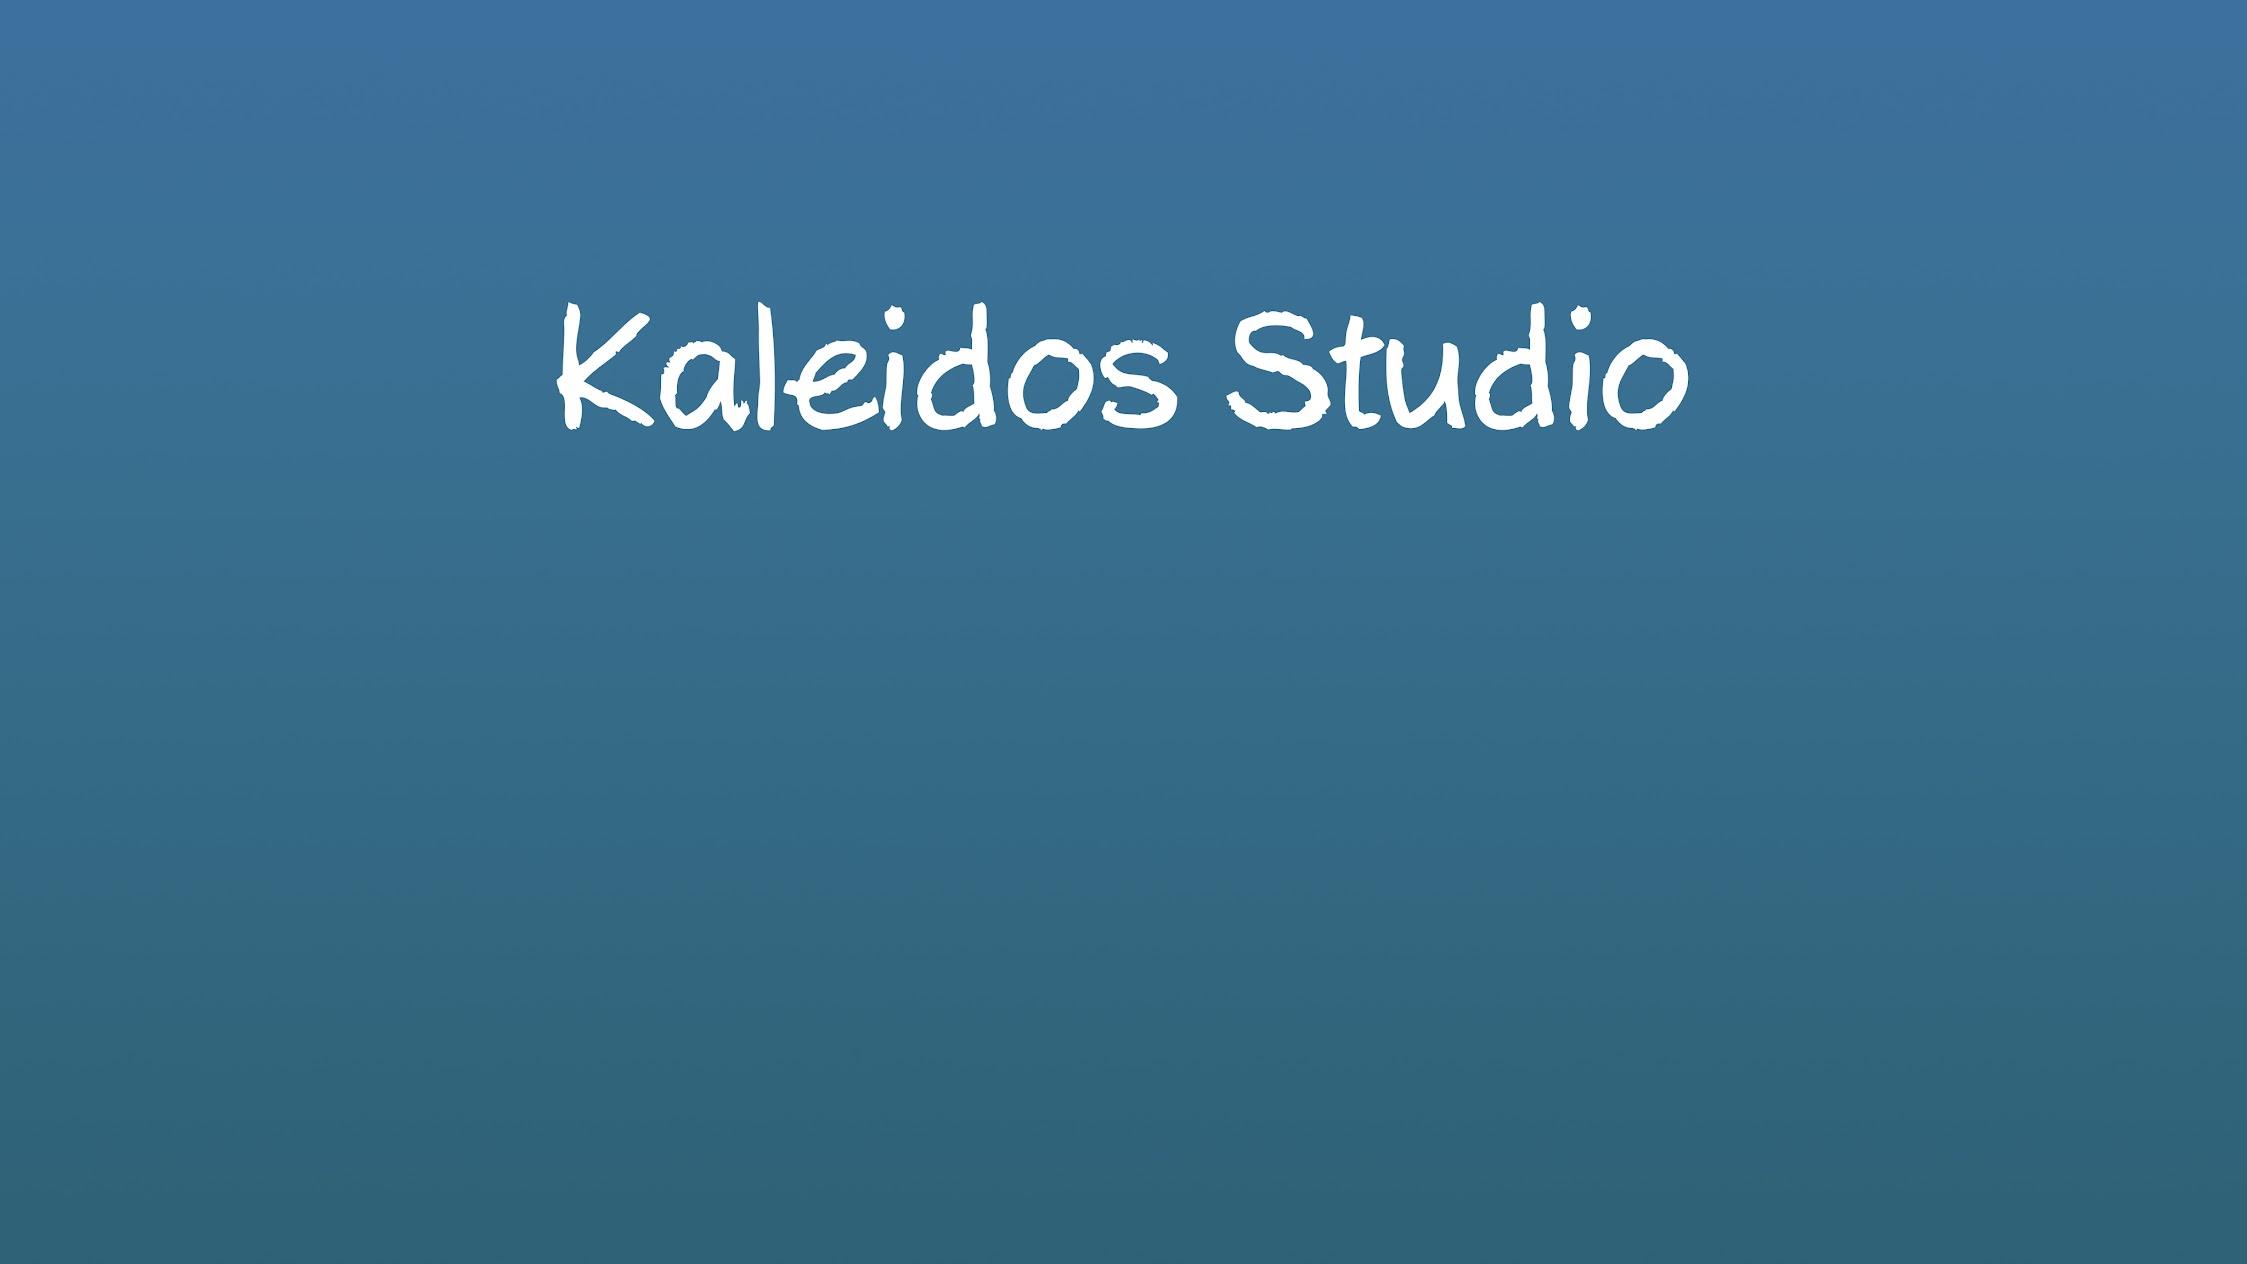 Kaleidos Studio